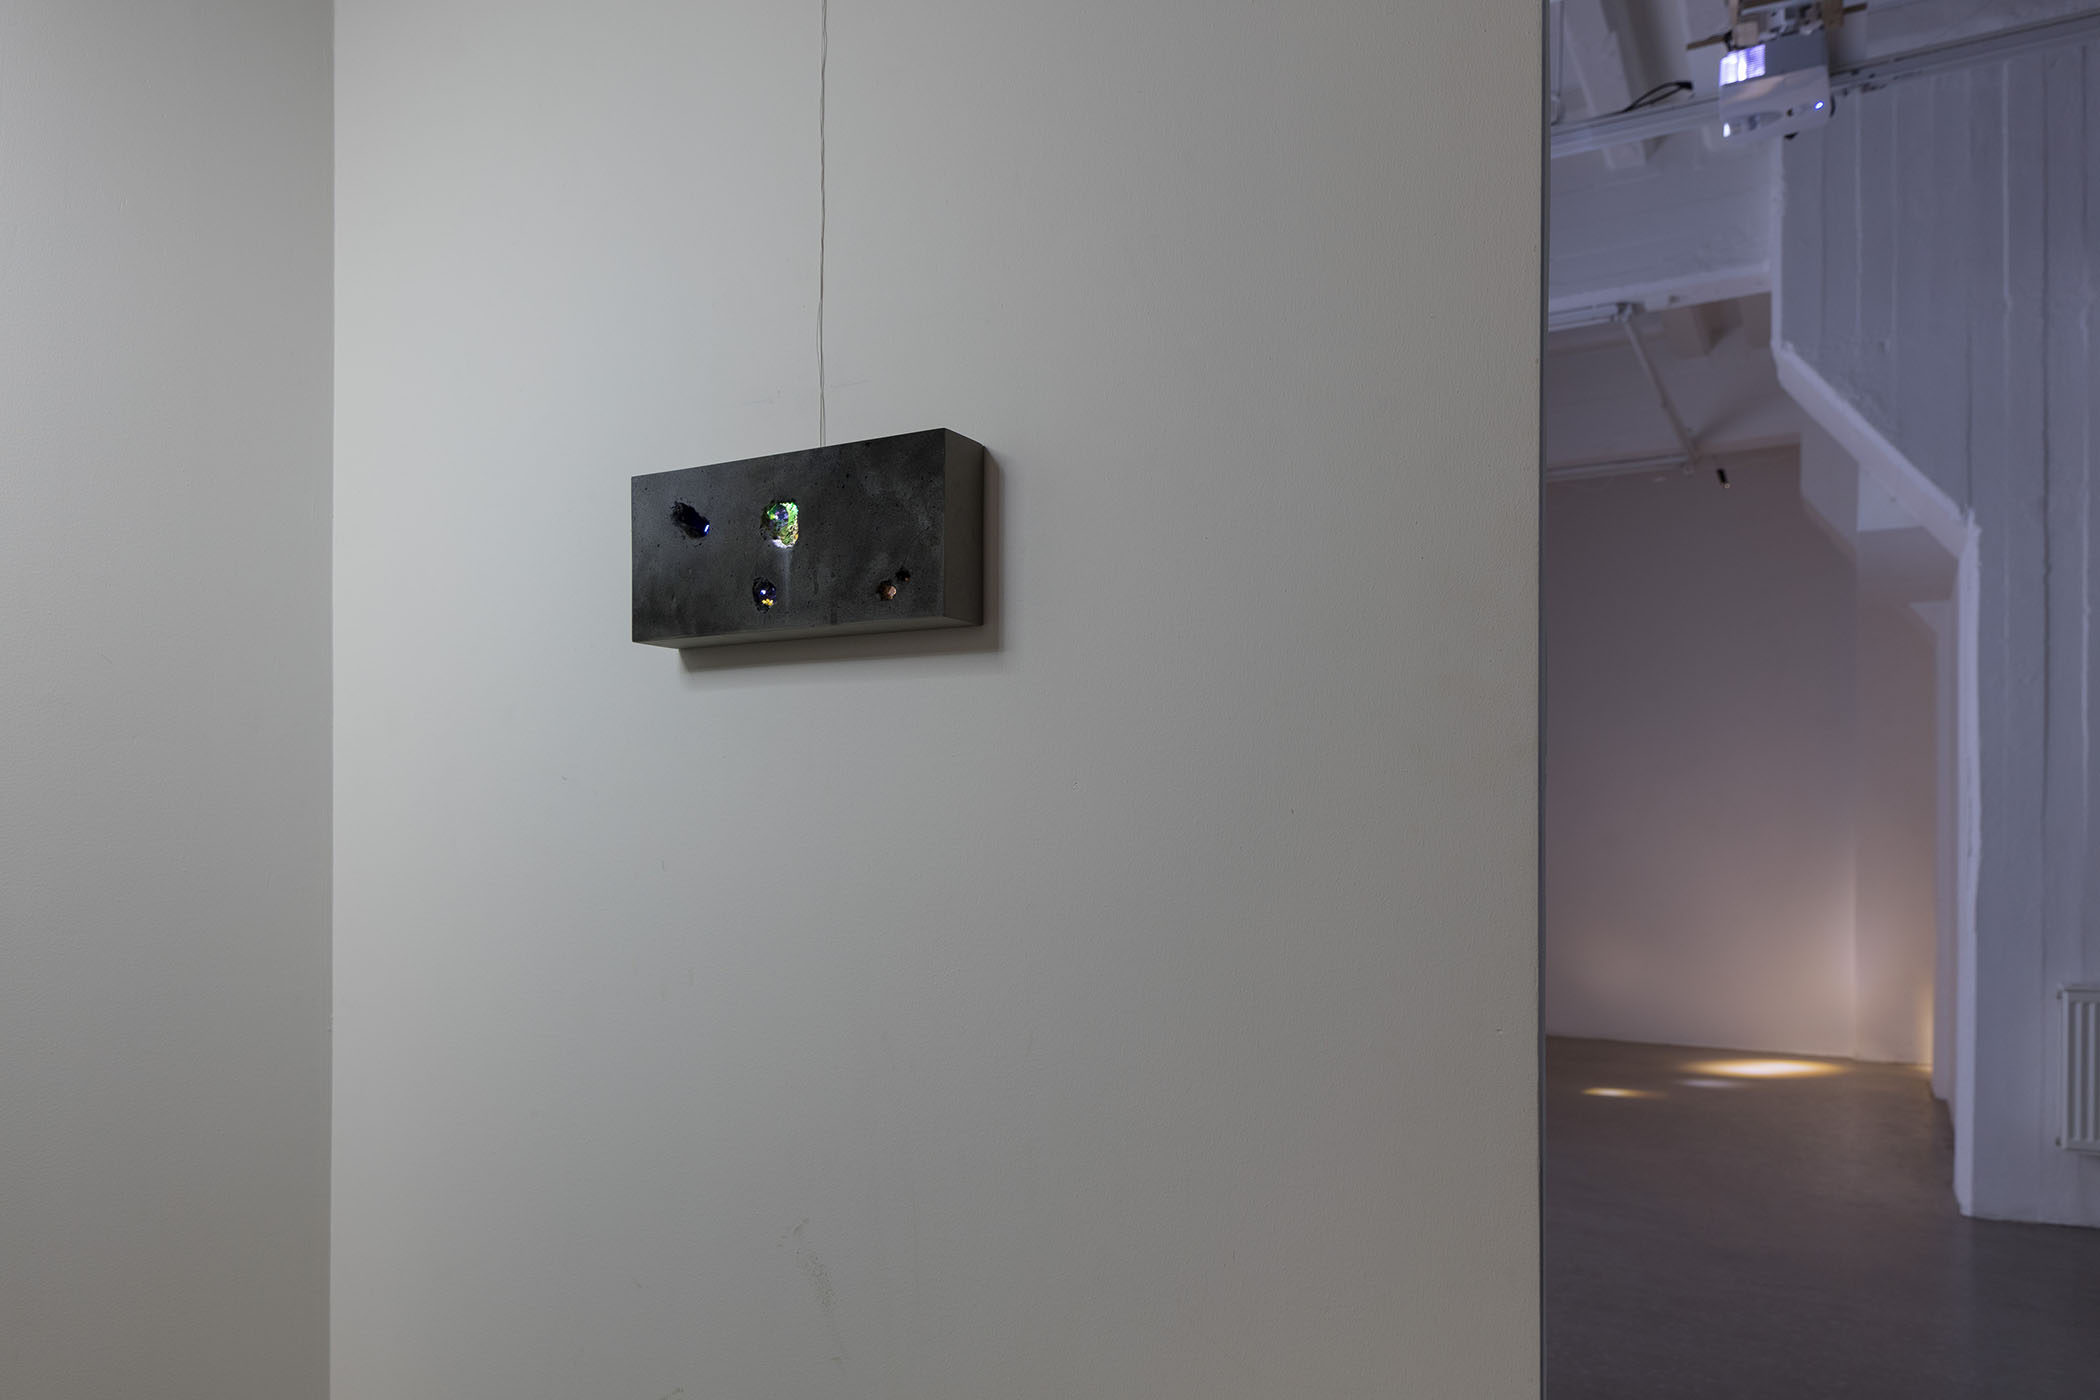 Oscar Furbacken - Concealed Expanse, installation view, 2017